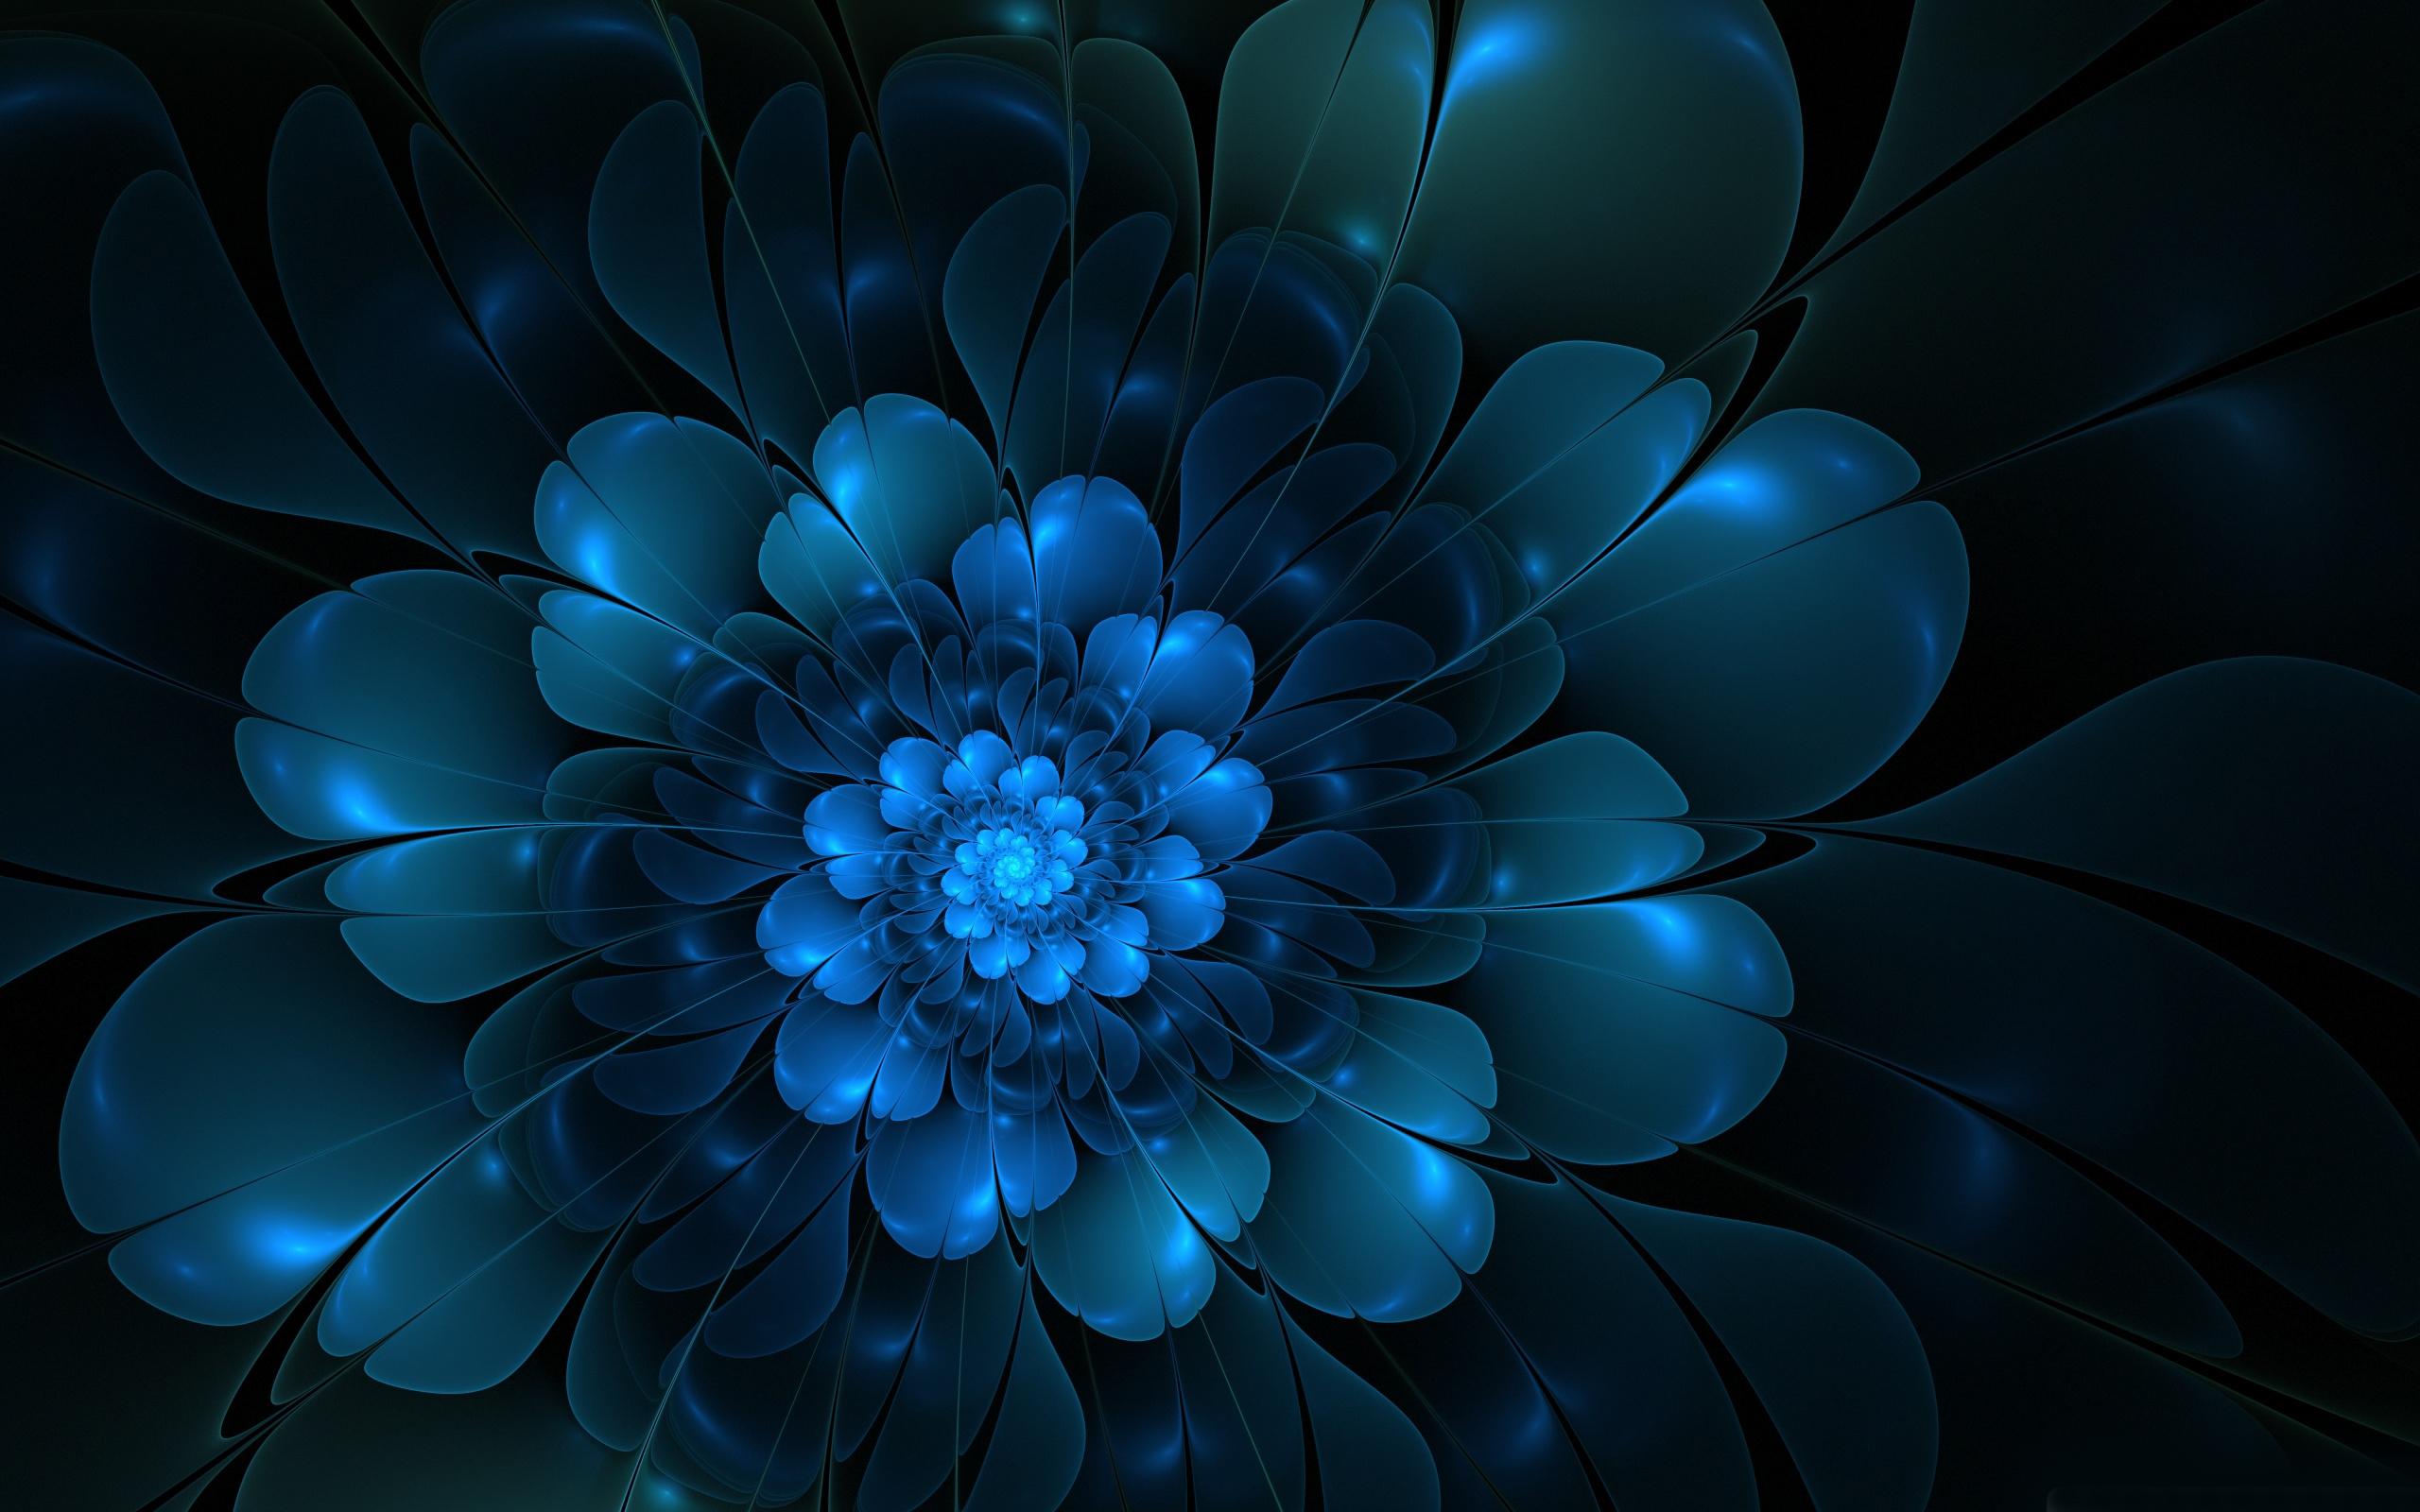 Blue Flower Dark background Creative Wallpaper Flowers Wallpaper 2560x1600